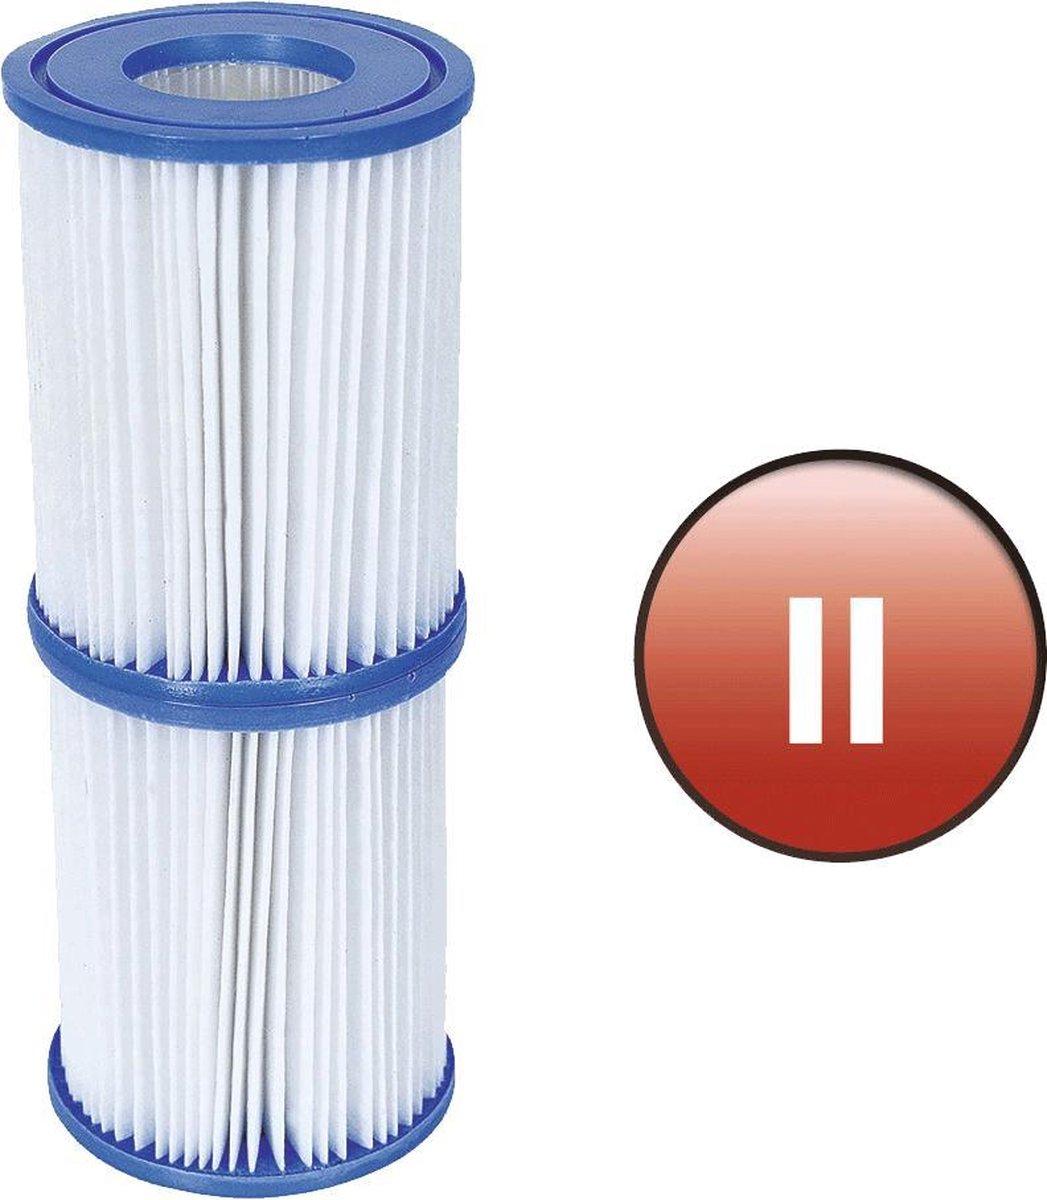 Bestway -Filter Cartridges - Zwembadfilter Type II - 2 stuks - nr. 58094